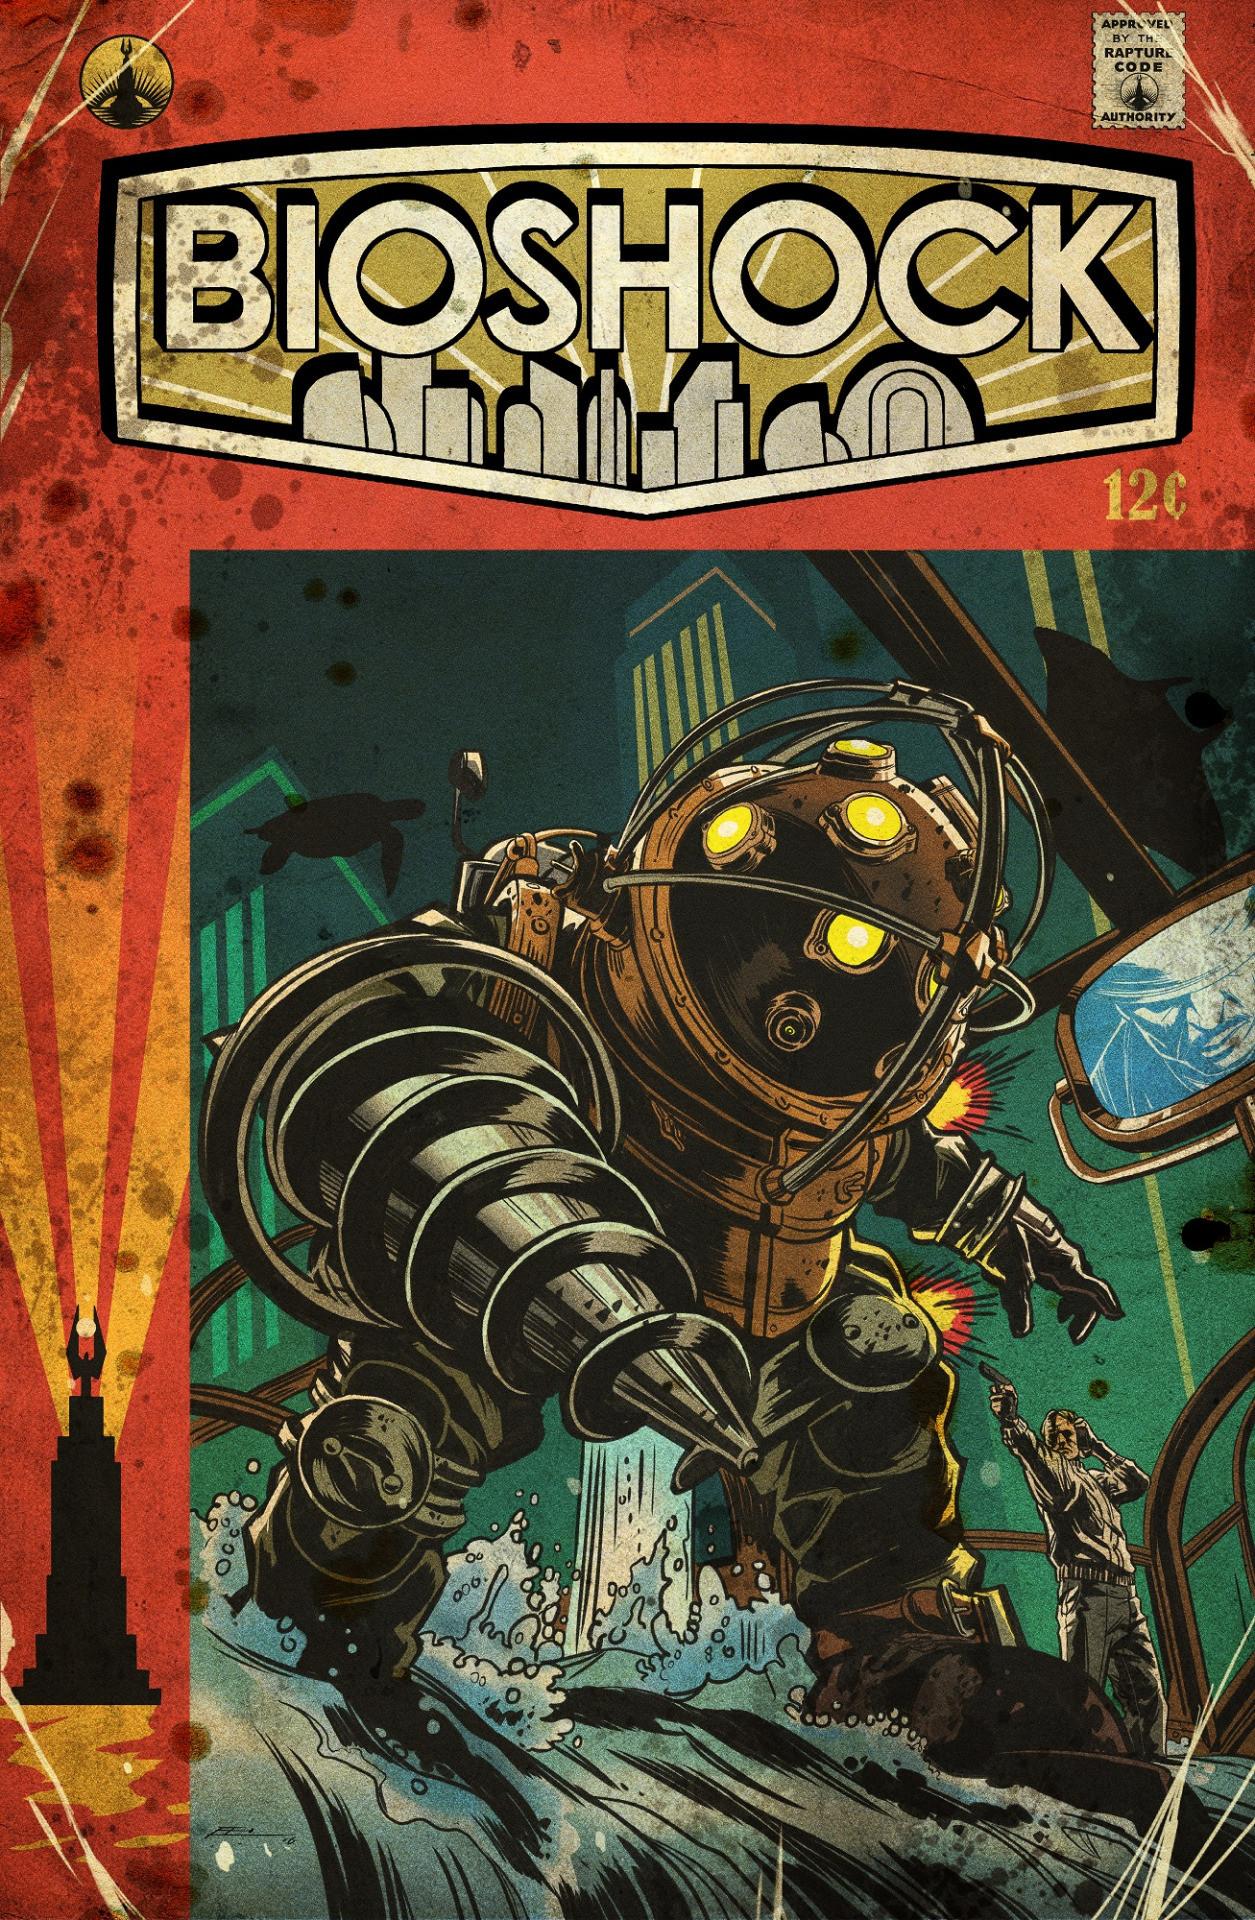 Comic Book Cover Artist Wanted : Artstation bioshock emilio lopez